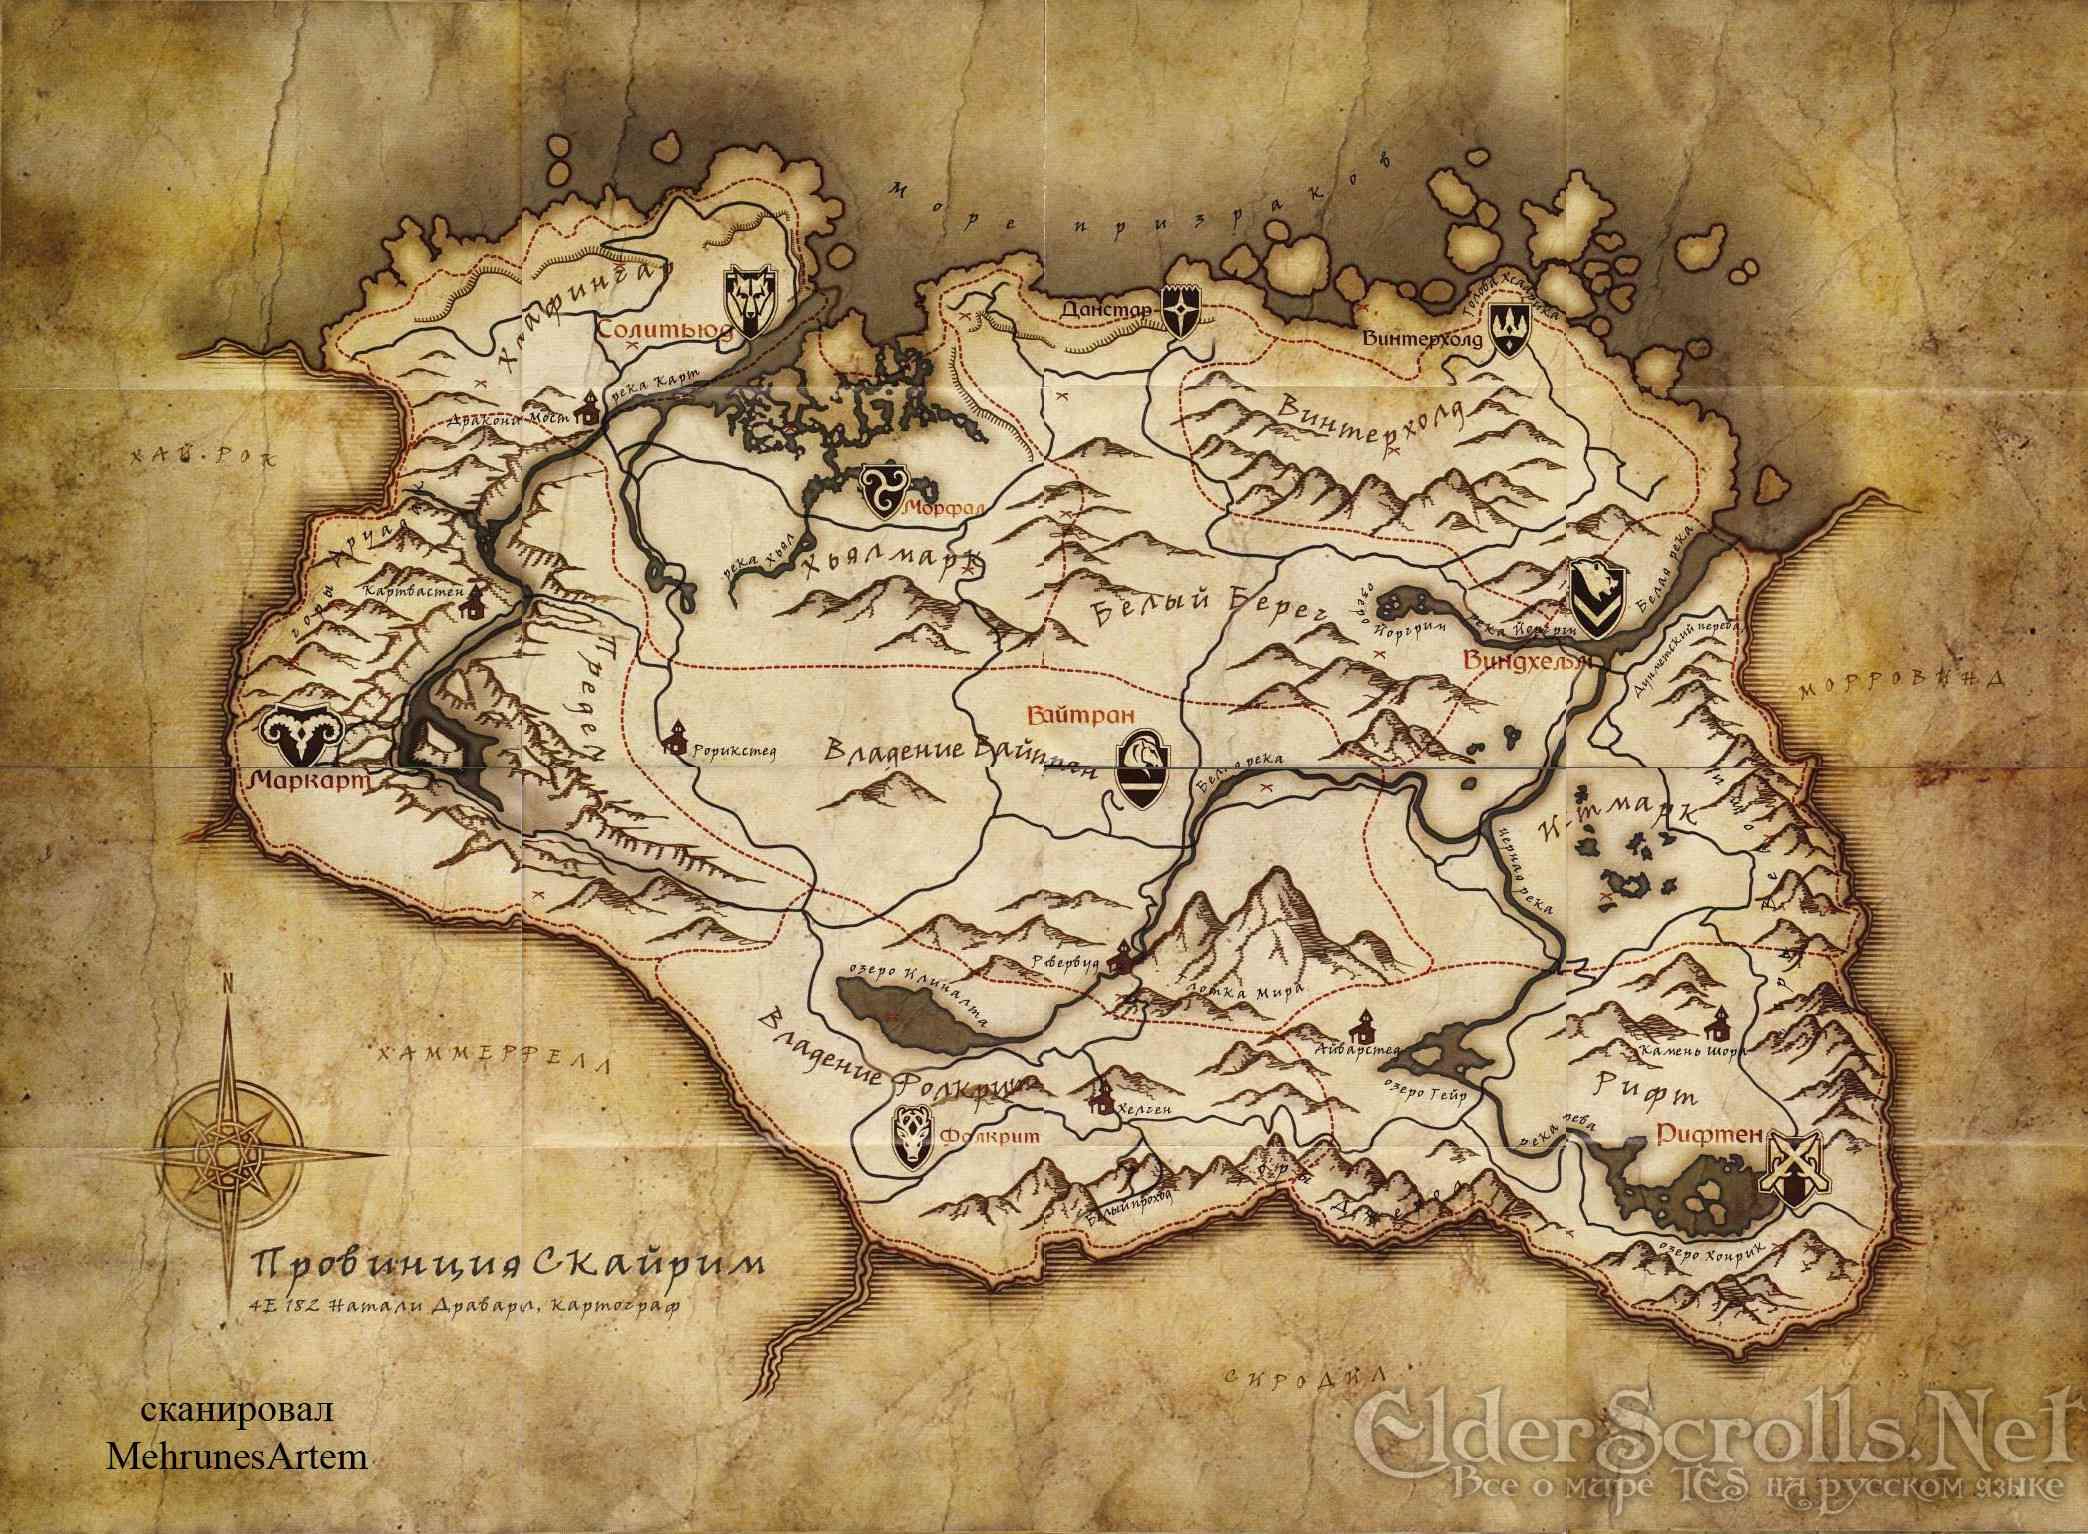 Blood Reaper/Skyrim Map Leaked Sort of